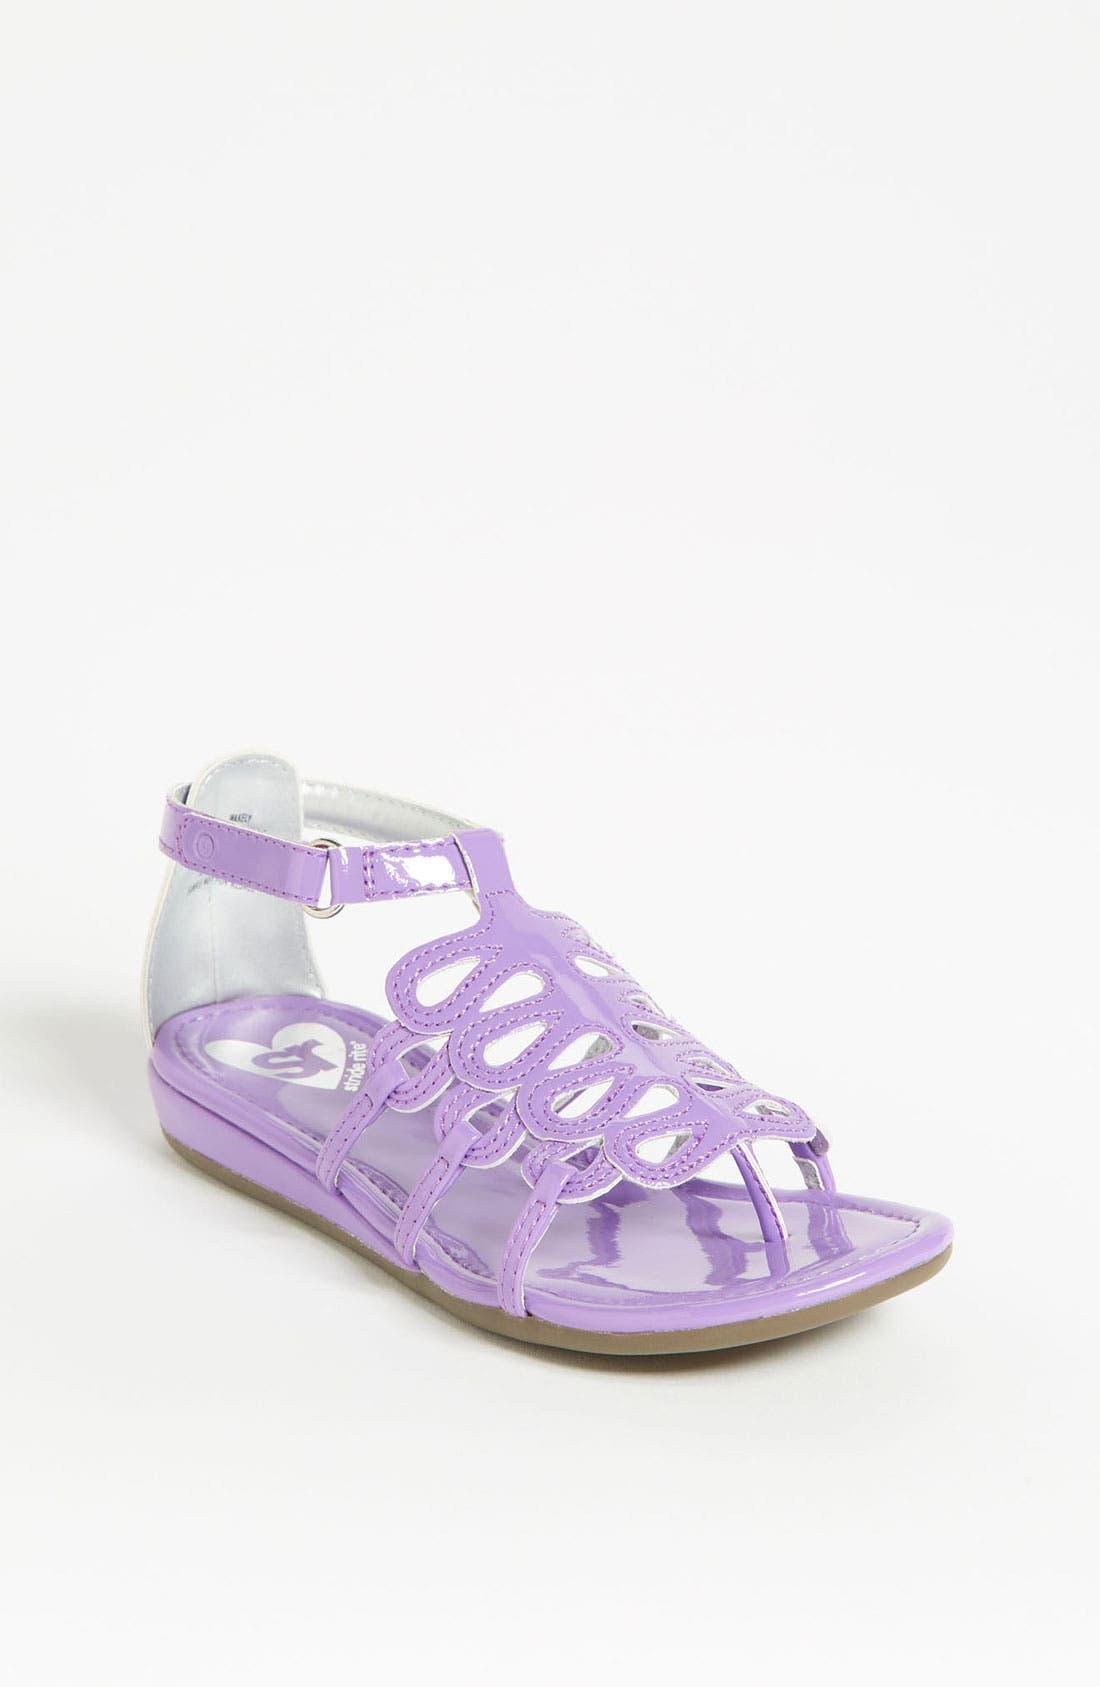 Main Image - Stride Rite 'Wakely' Sandal (Toddler)